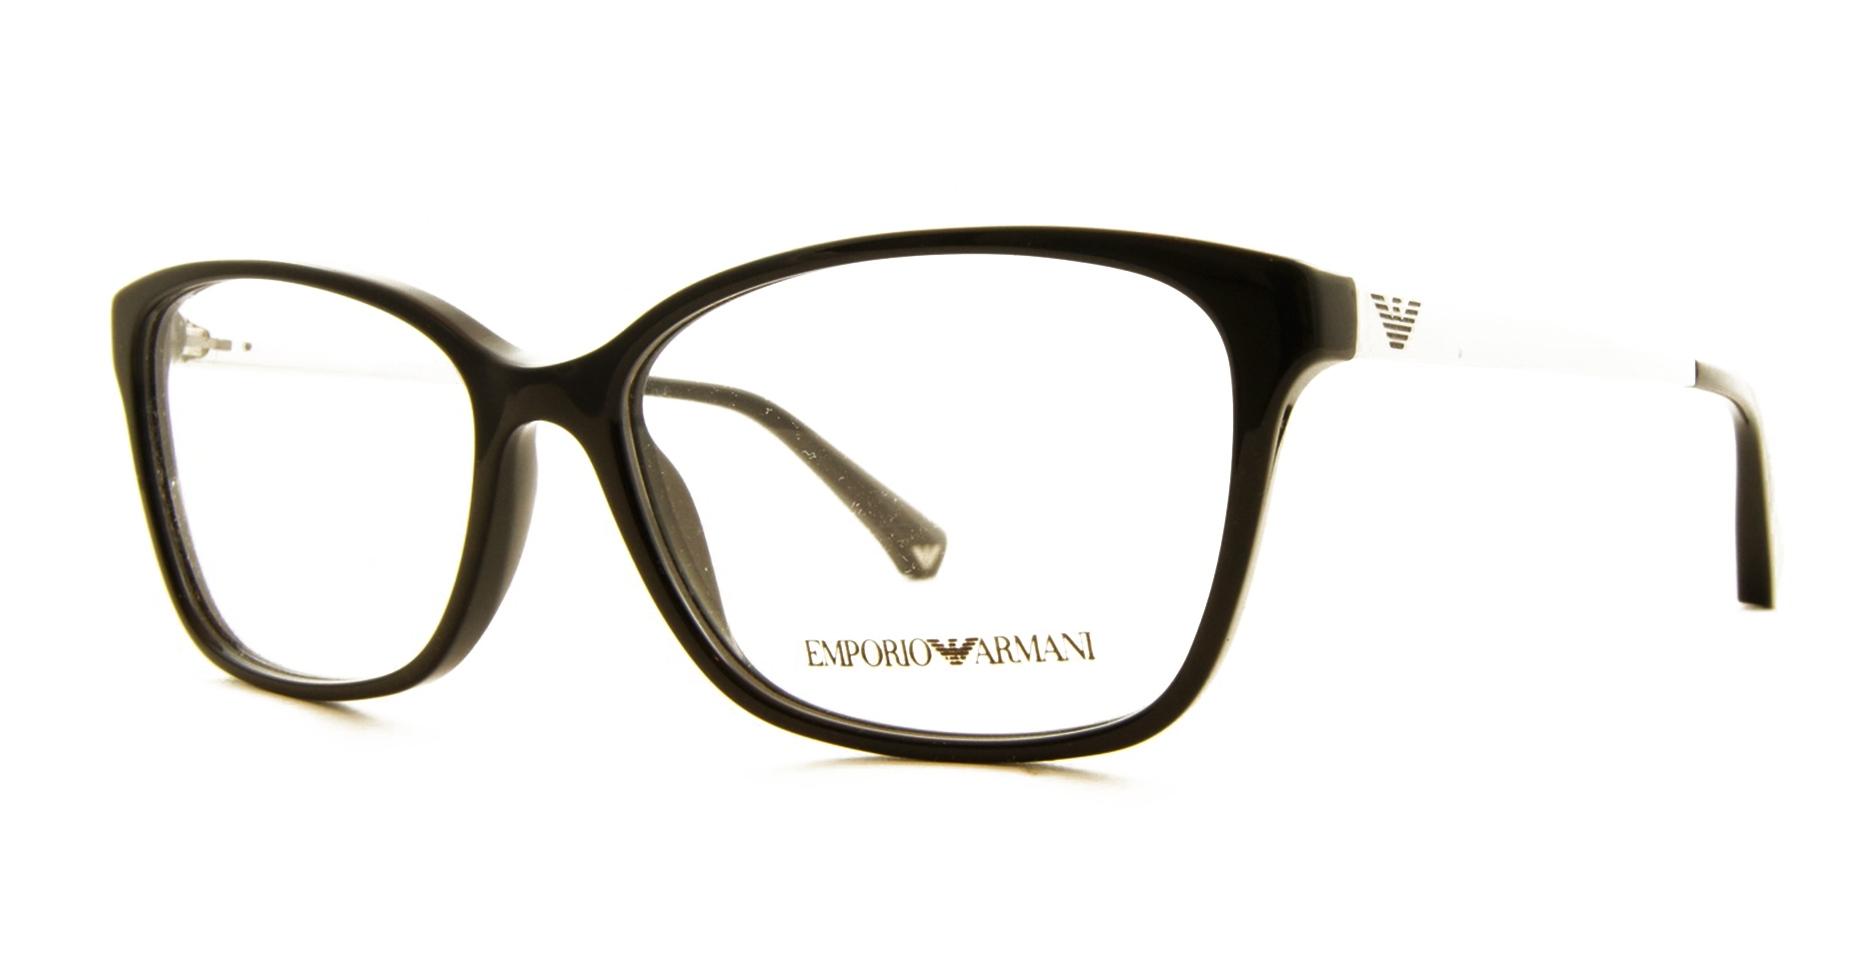 8e07e6d7086ce8 Okulary korekcyjne EMPORIO ARMANI model EA 3026 5017 - dooka.pl